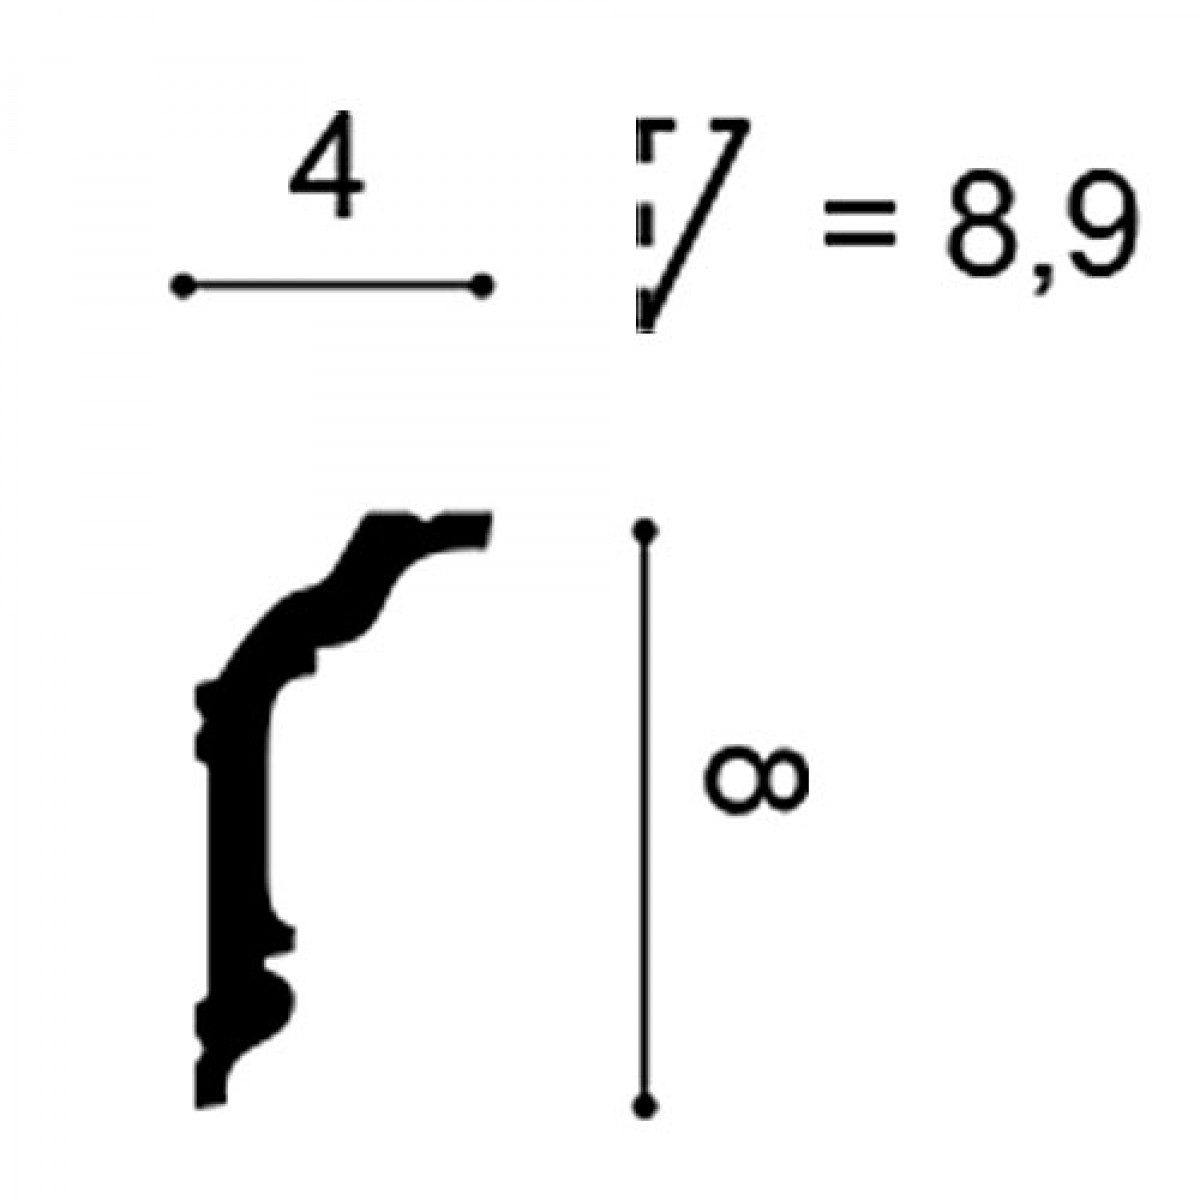 Cornisa AXXENT CX176, Dimensiuni: 200 X 4 X 8 cm, Orac Decor